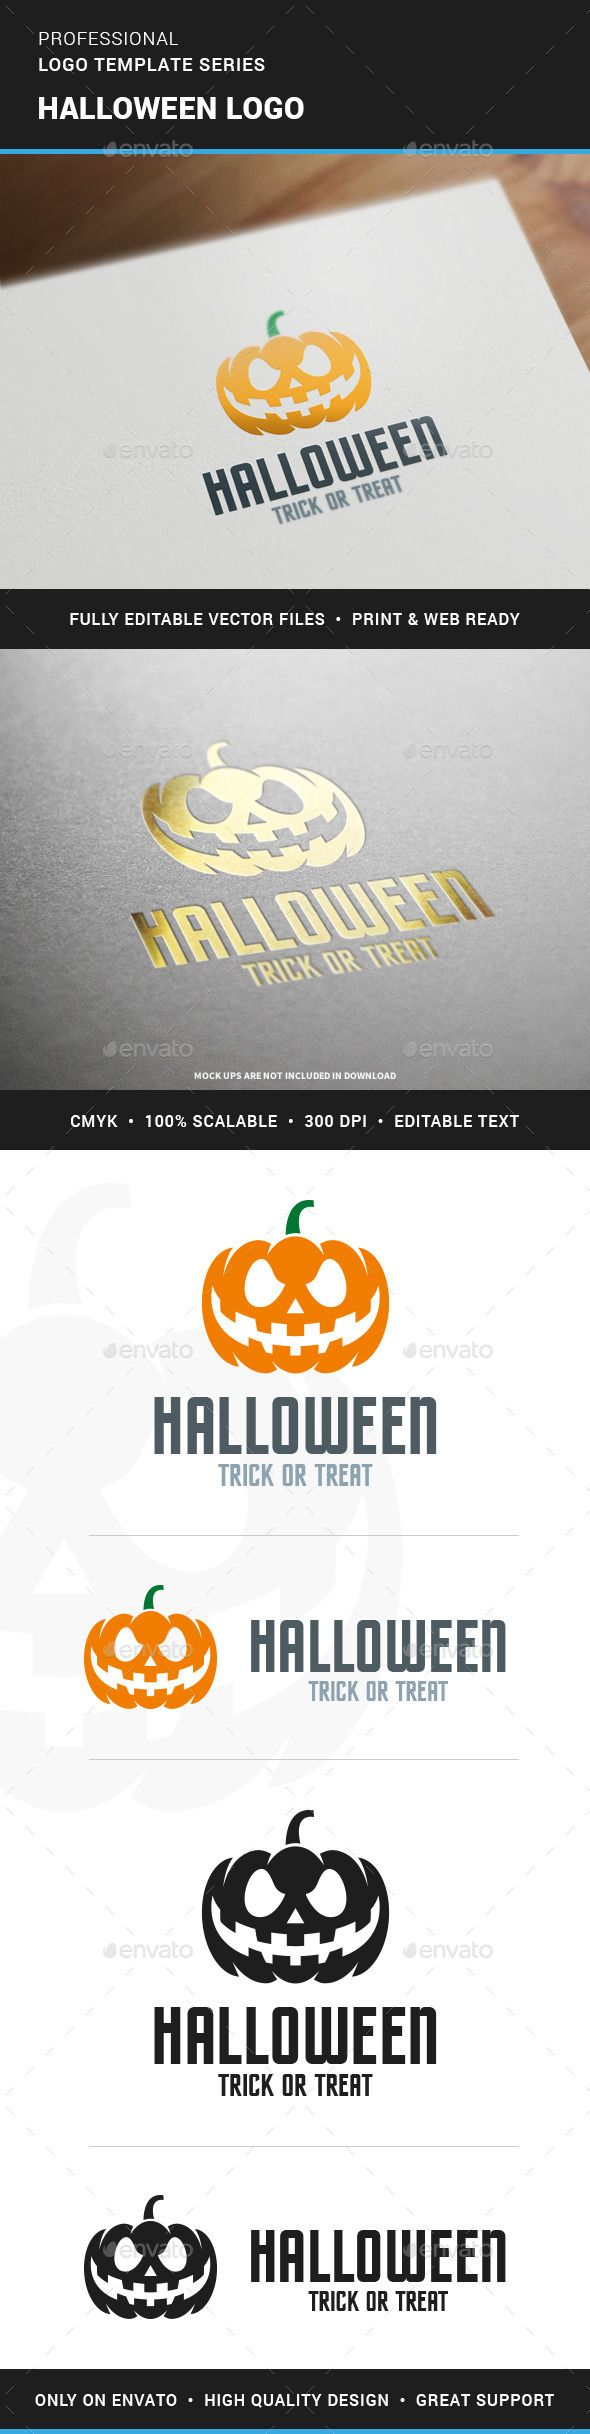 Halloween Logo Template